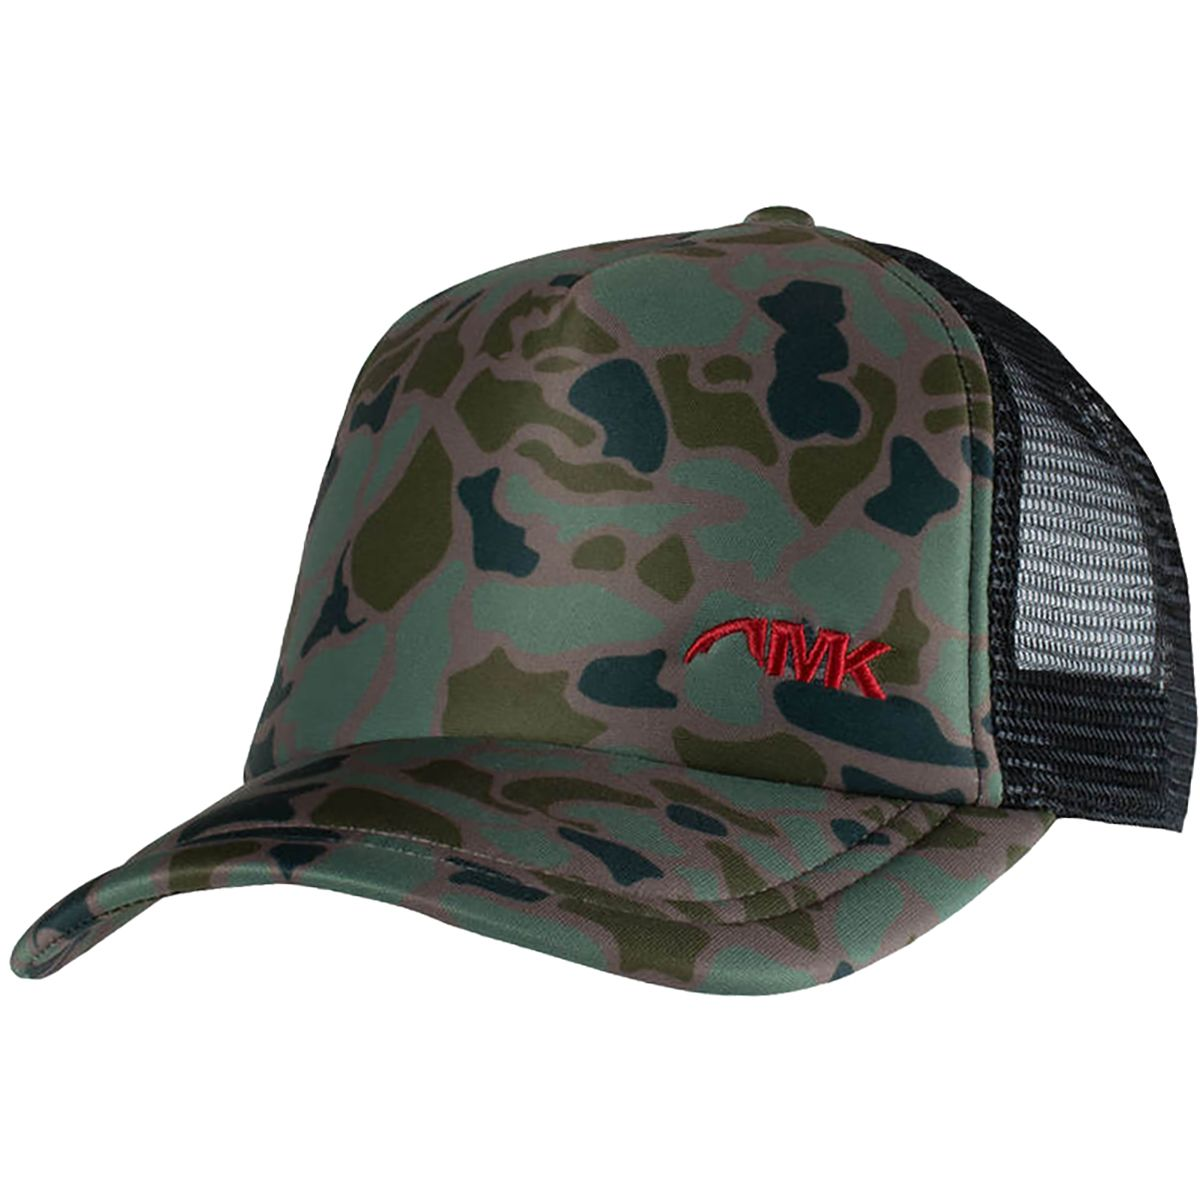 Hiking Backpacking Climbing  Camo Camouflage Snapback Mesh Trucker Hat Cap